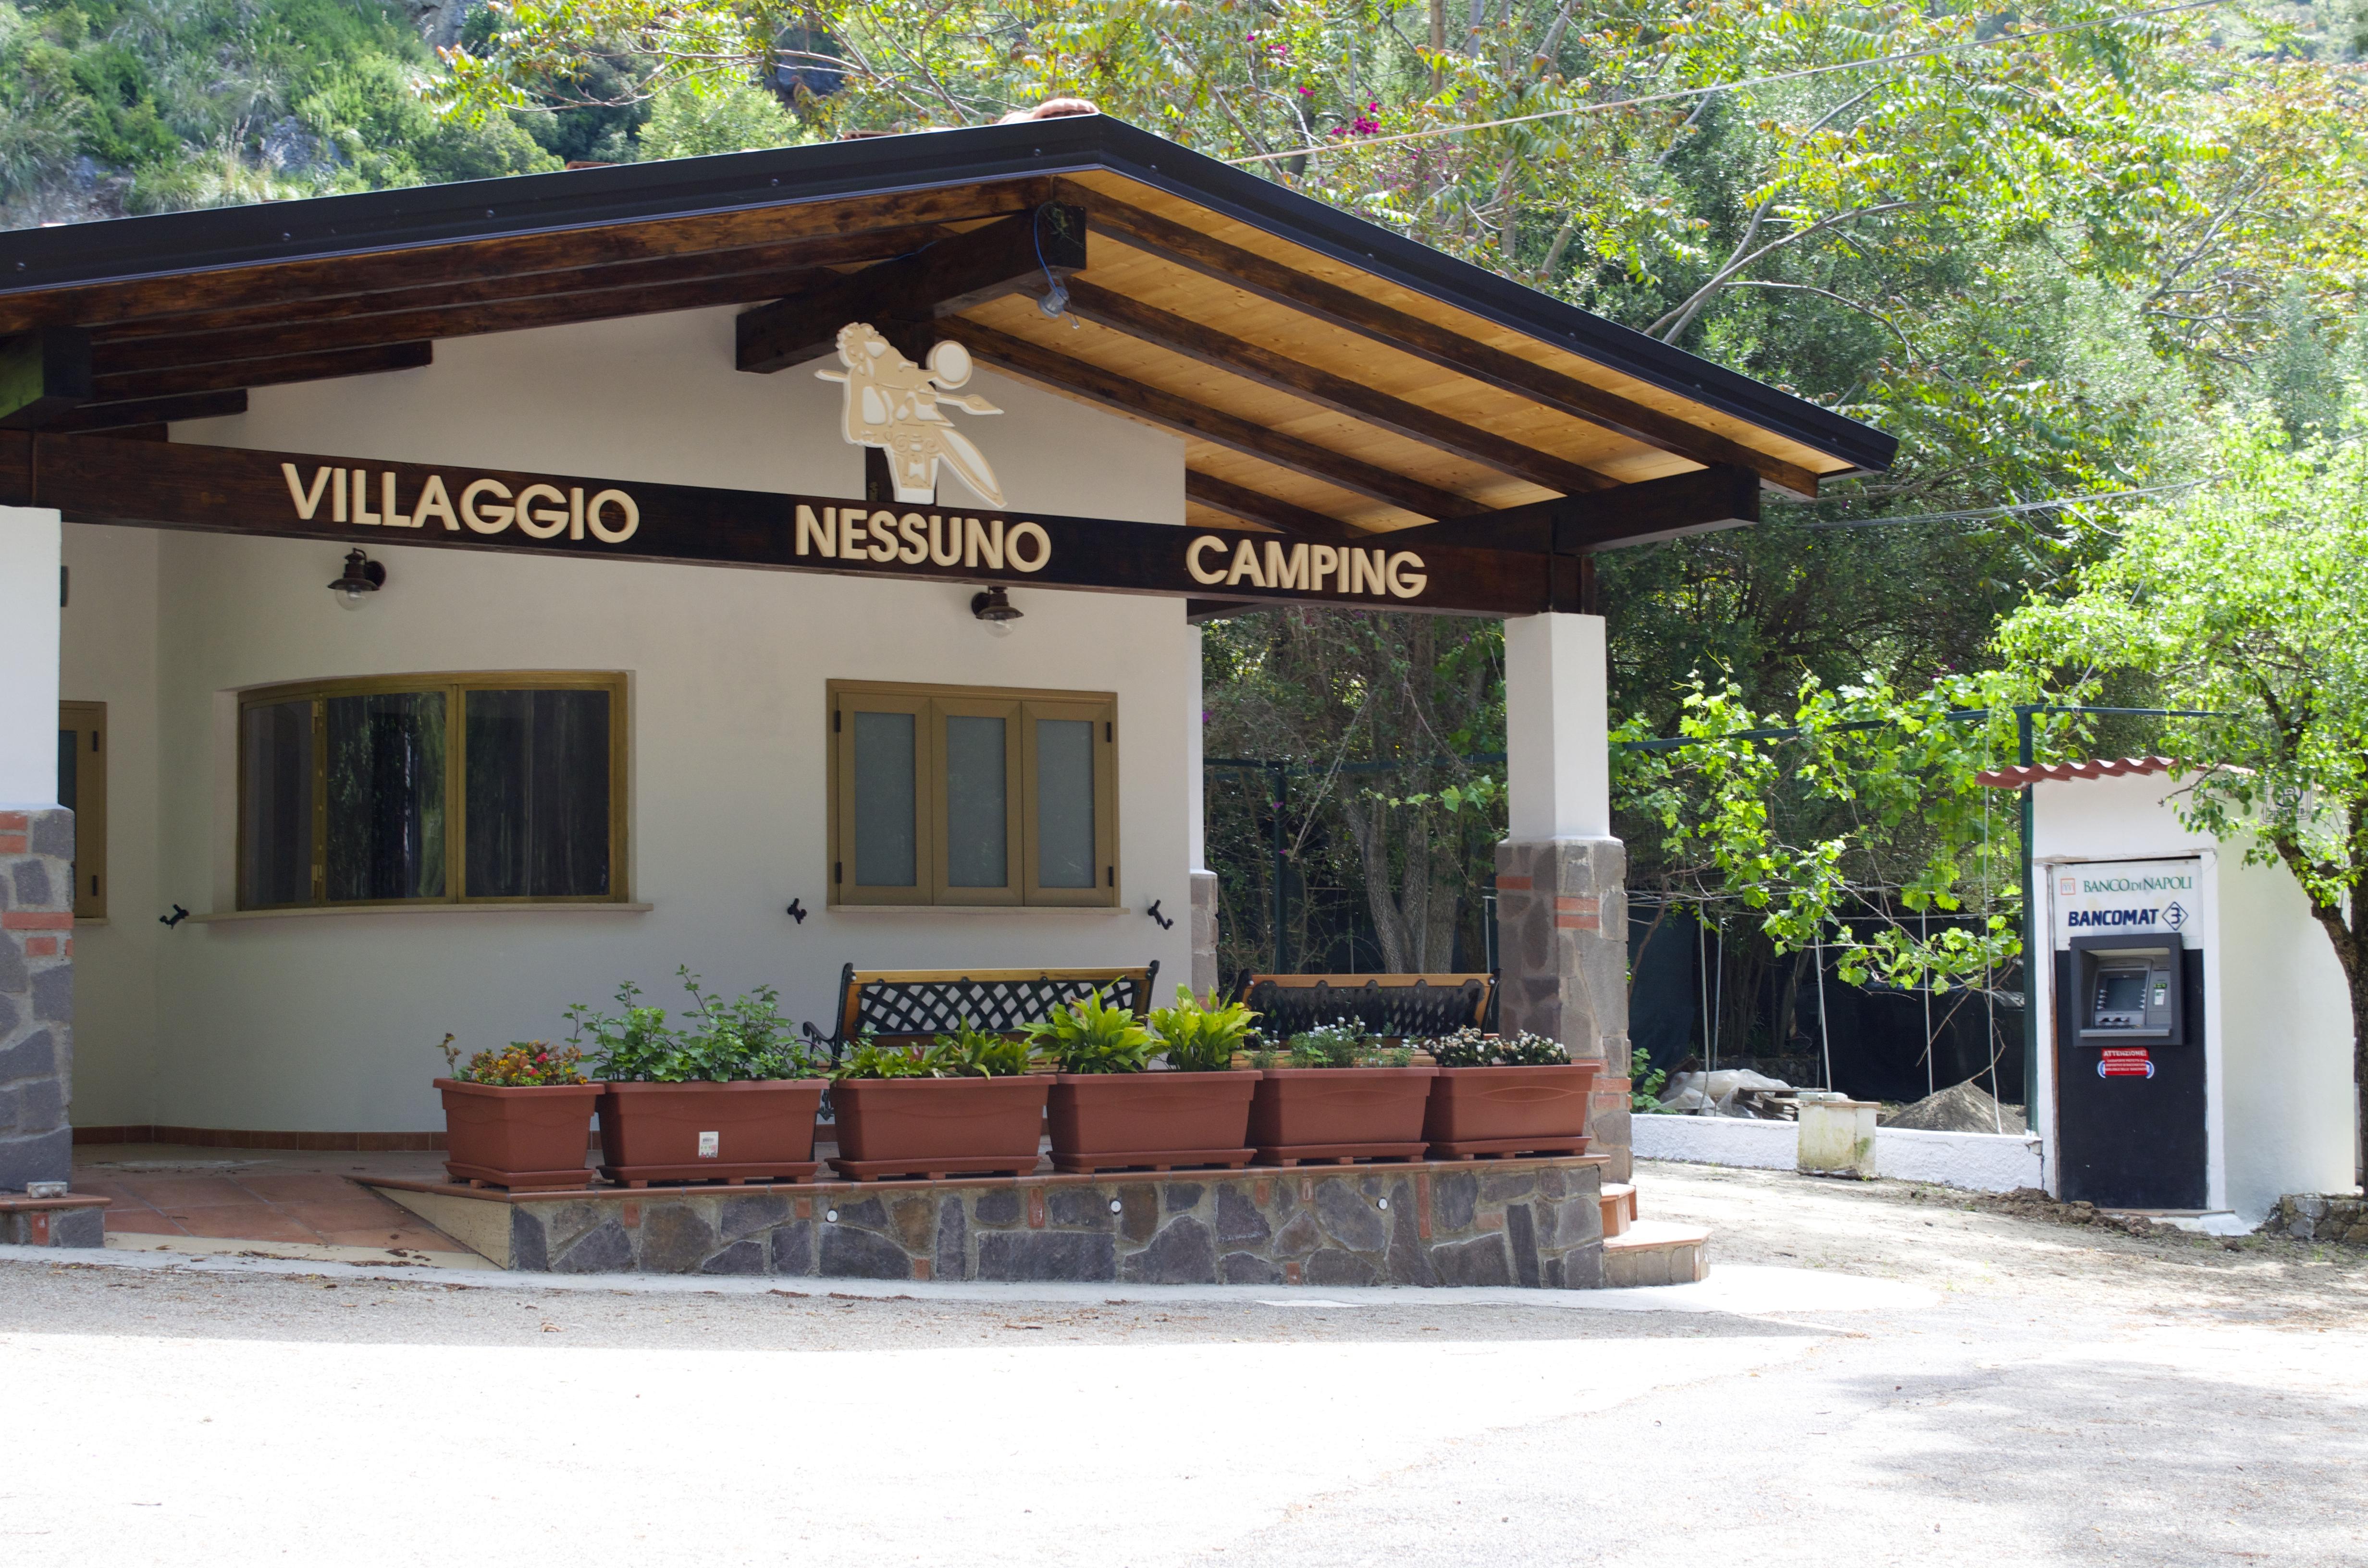 Villagio Nessuno